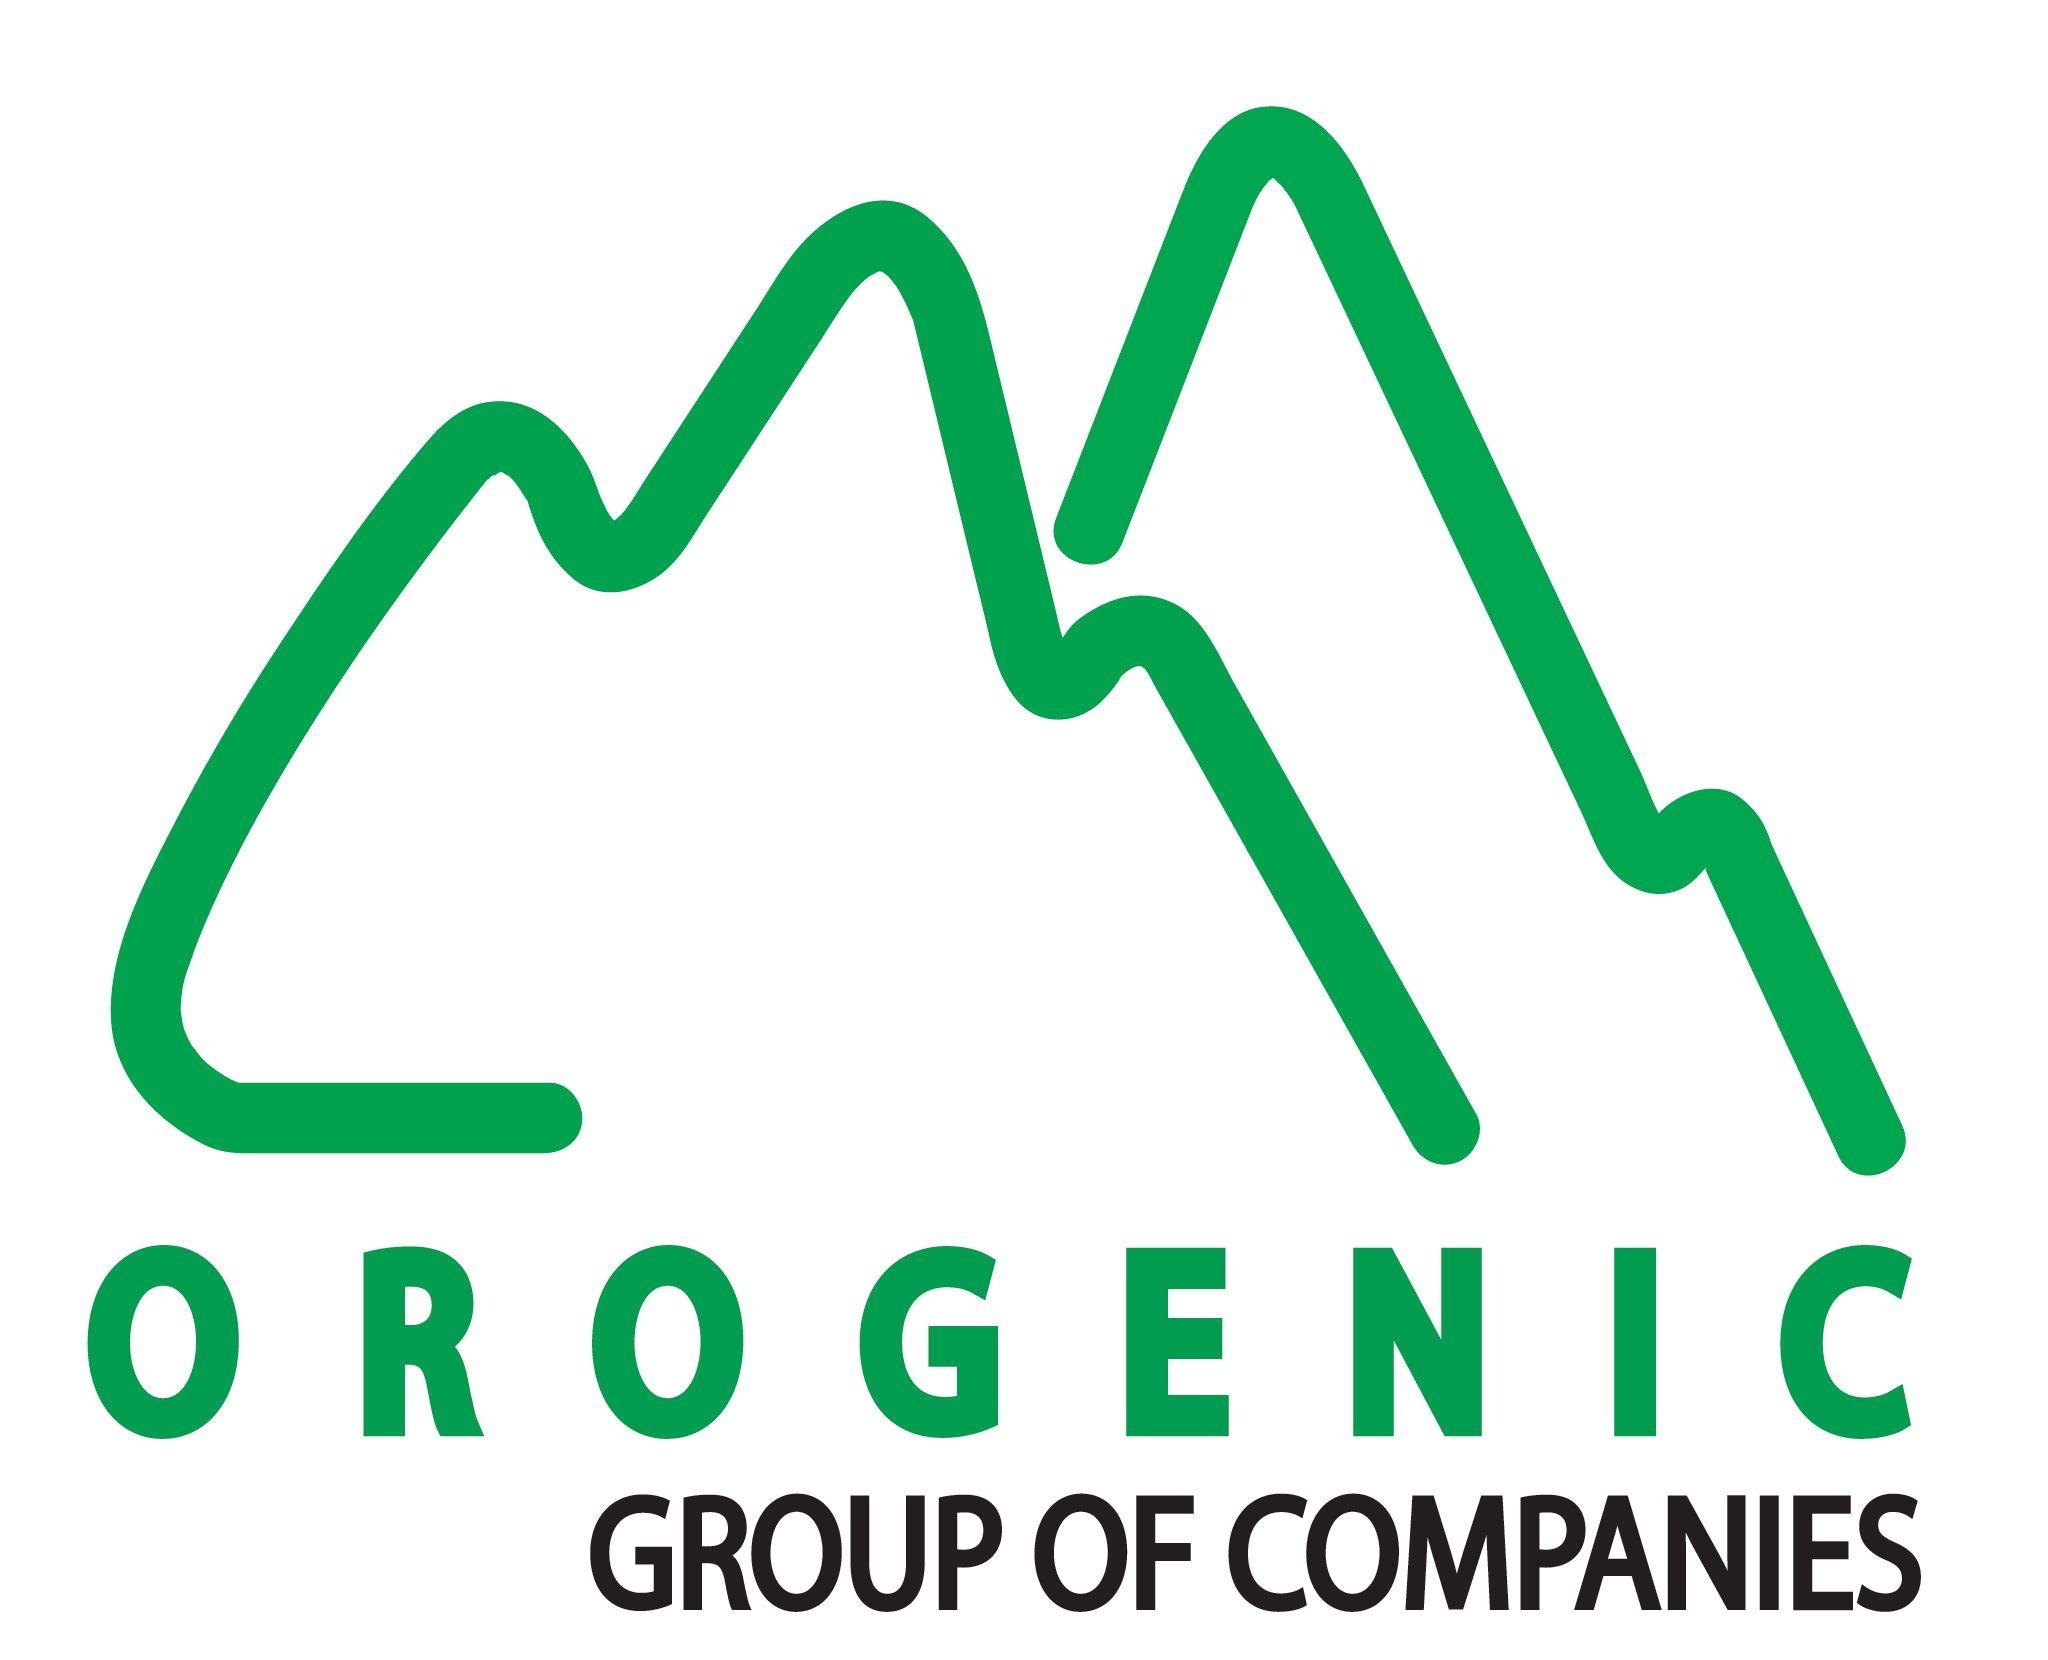 orogenic-group Logo.jpg (2048×1660)